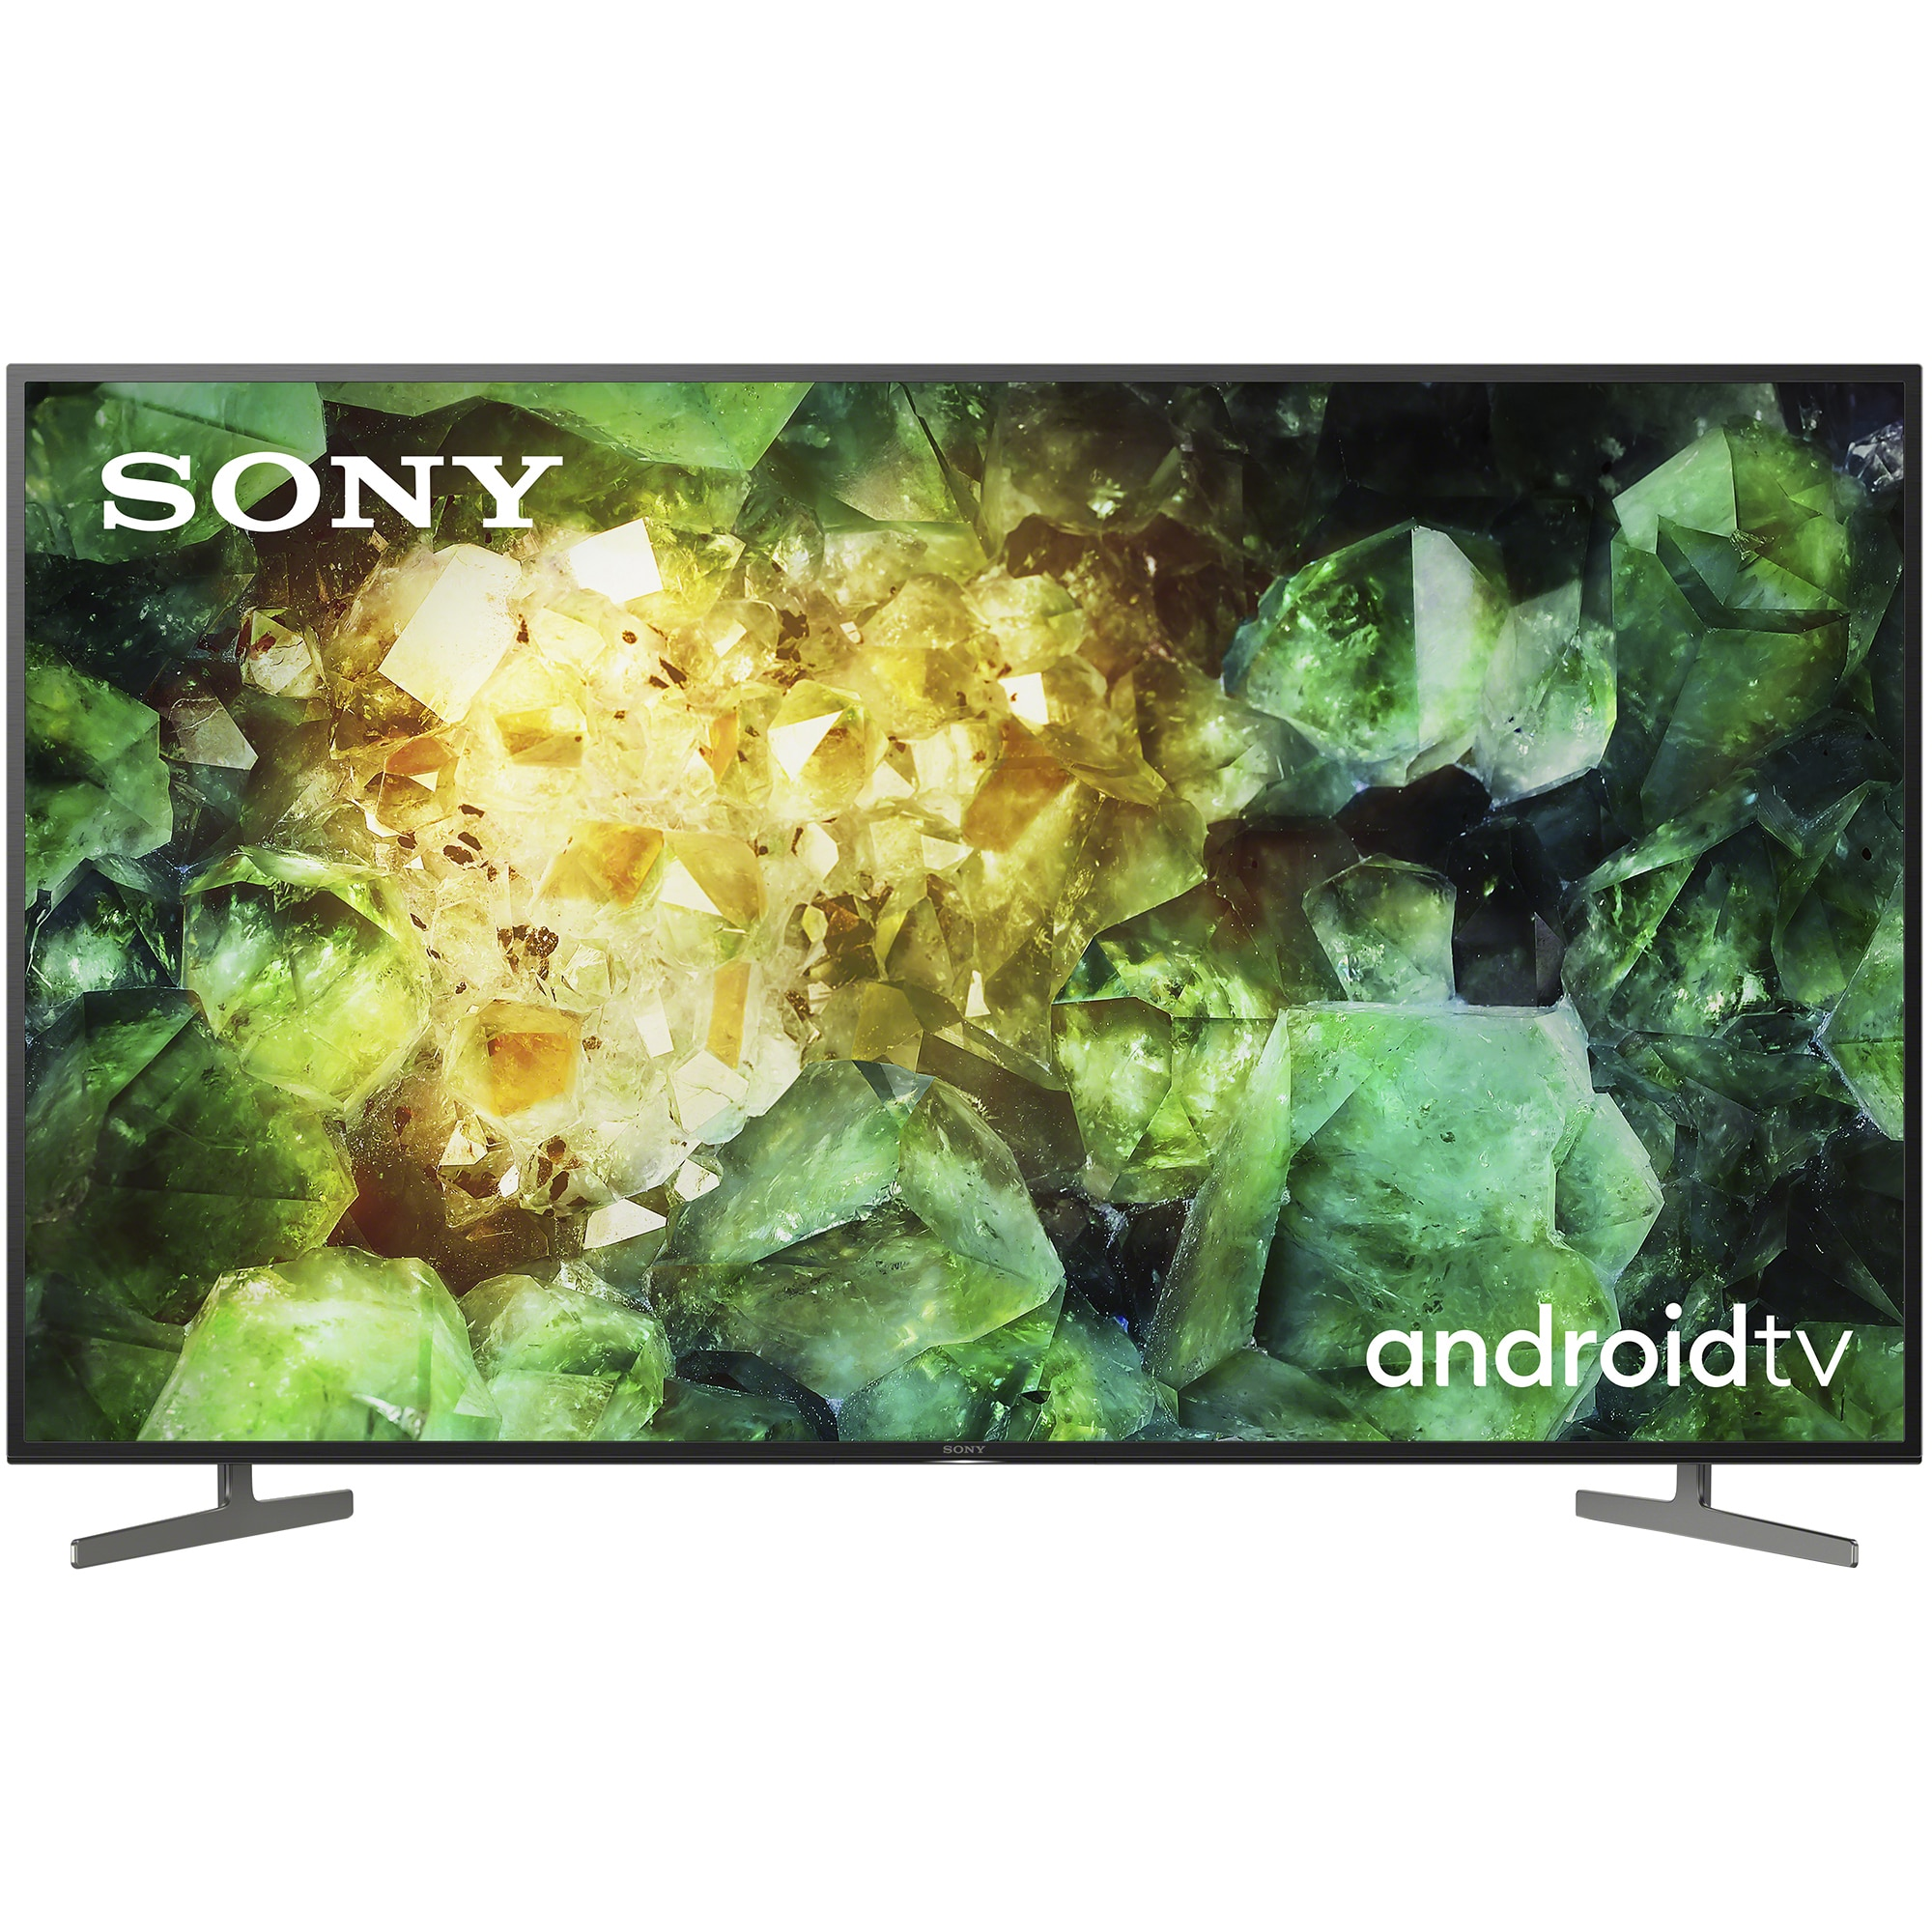 Fotografie Televizor Sony 55XH8196, 138.8 cm, Smart Android, 4K Ultra HD, LED, Clasa G